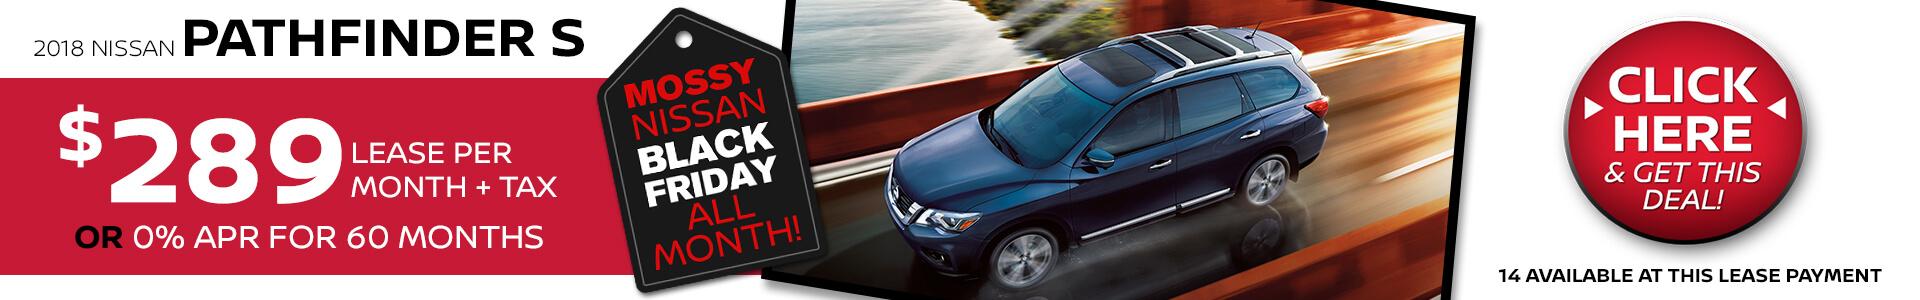 Nissan Pathfinder $289 Lease